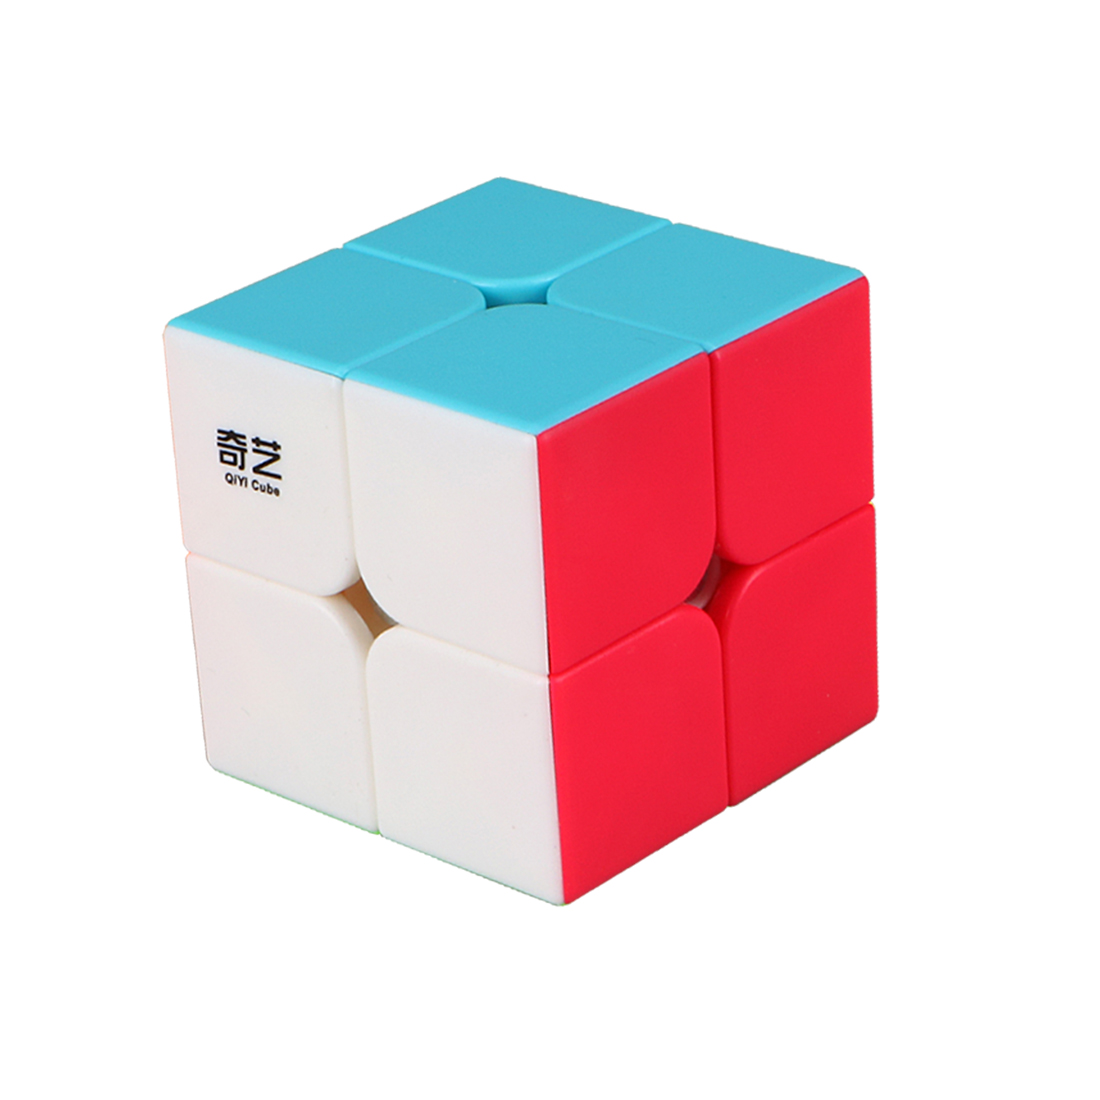 qidi - Qiyi QiDi S 2x2 Magic Cube Speed Cube Toy for kids boys 2019